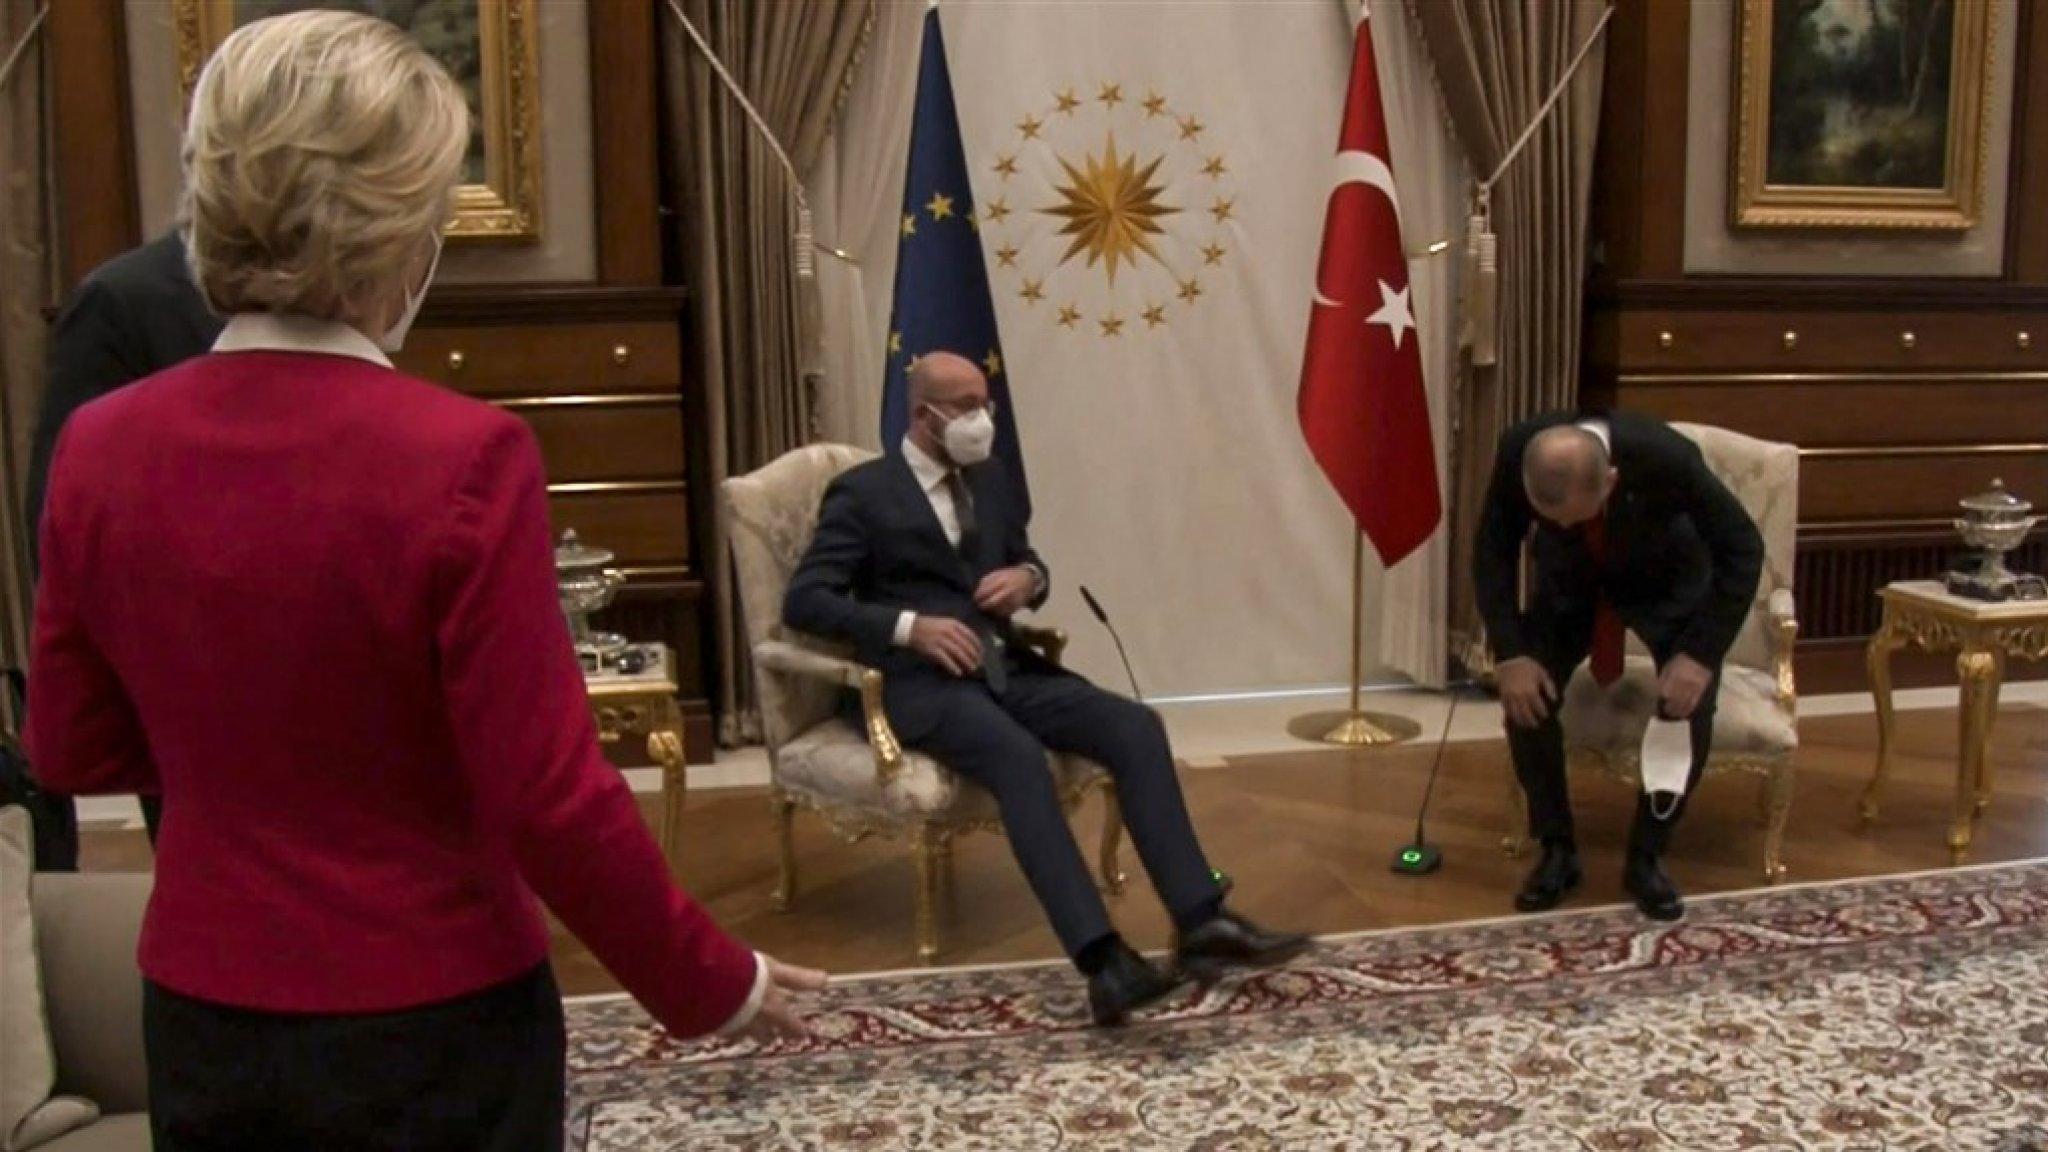 Ophef over behandeling EU-kopstuk Von der Leyen in Turkije